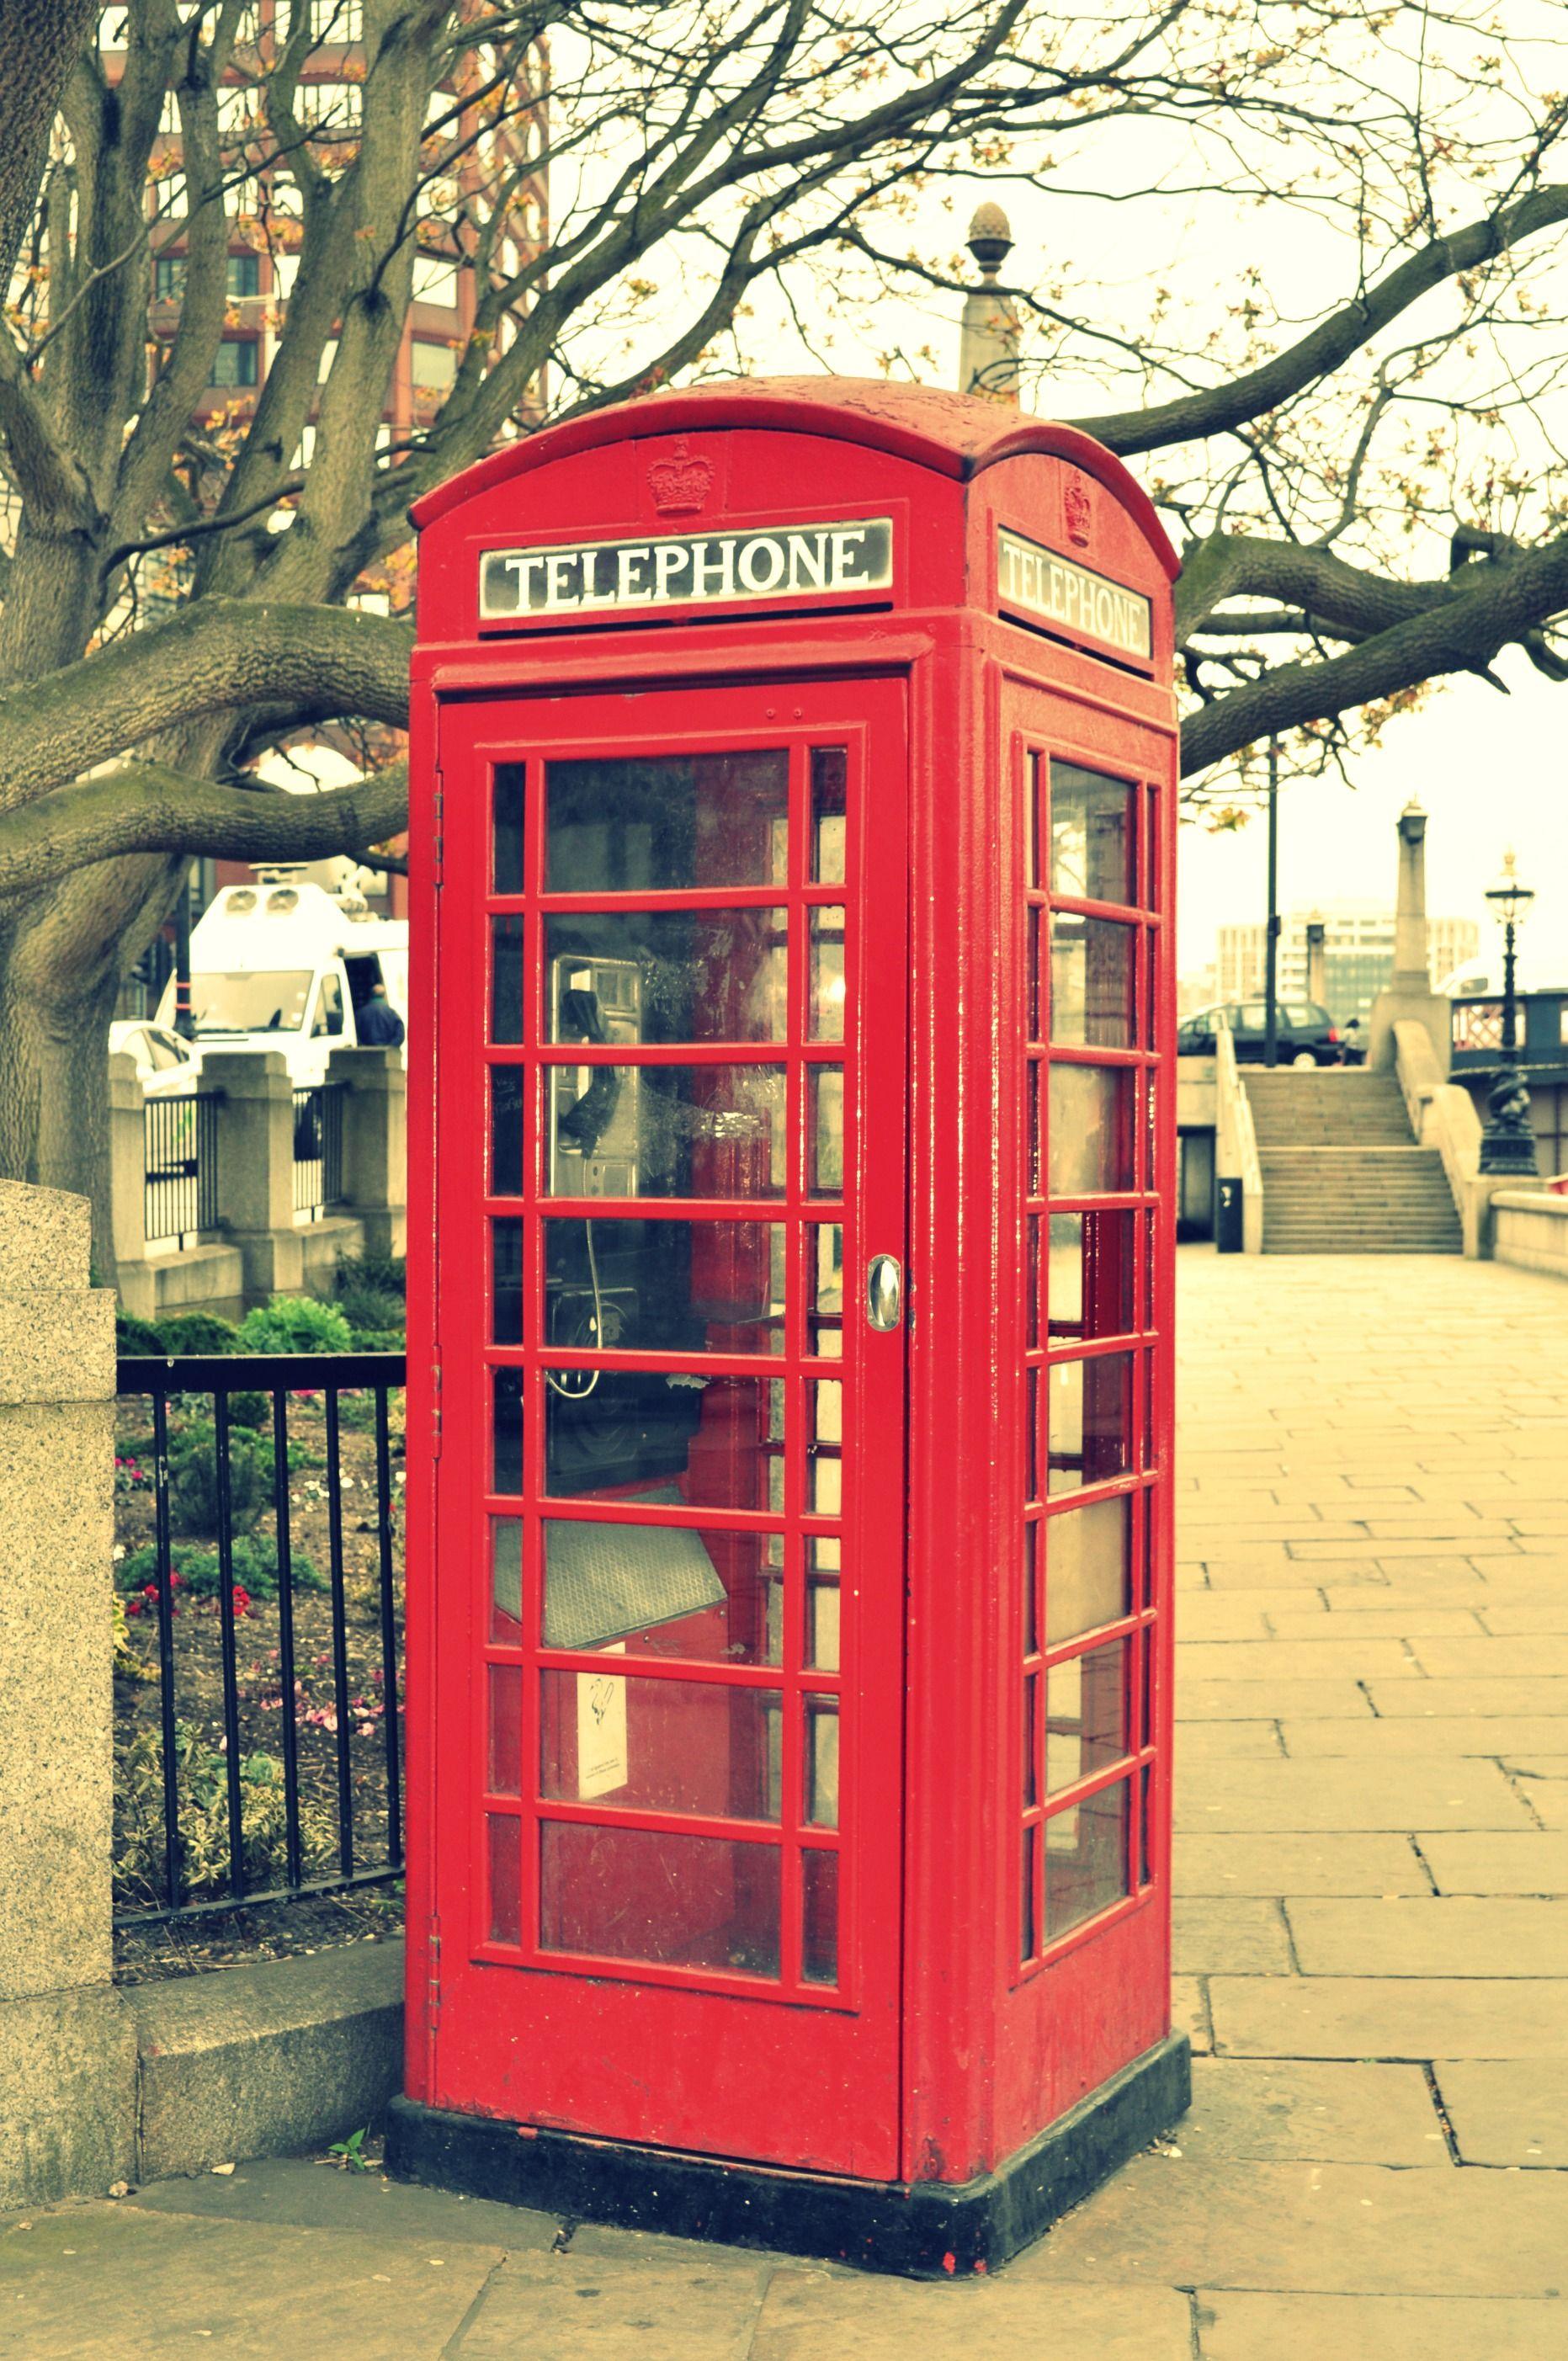 London Telephone Booth Travel Pinterest Telephone Booth London And Telephone